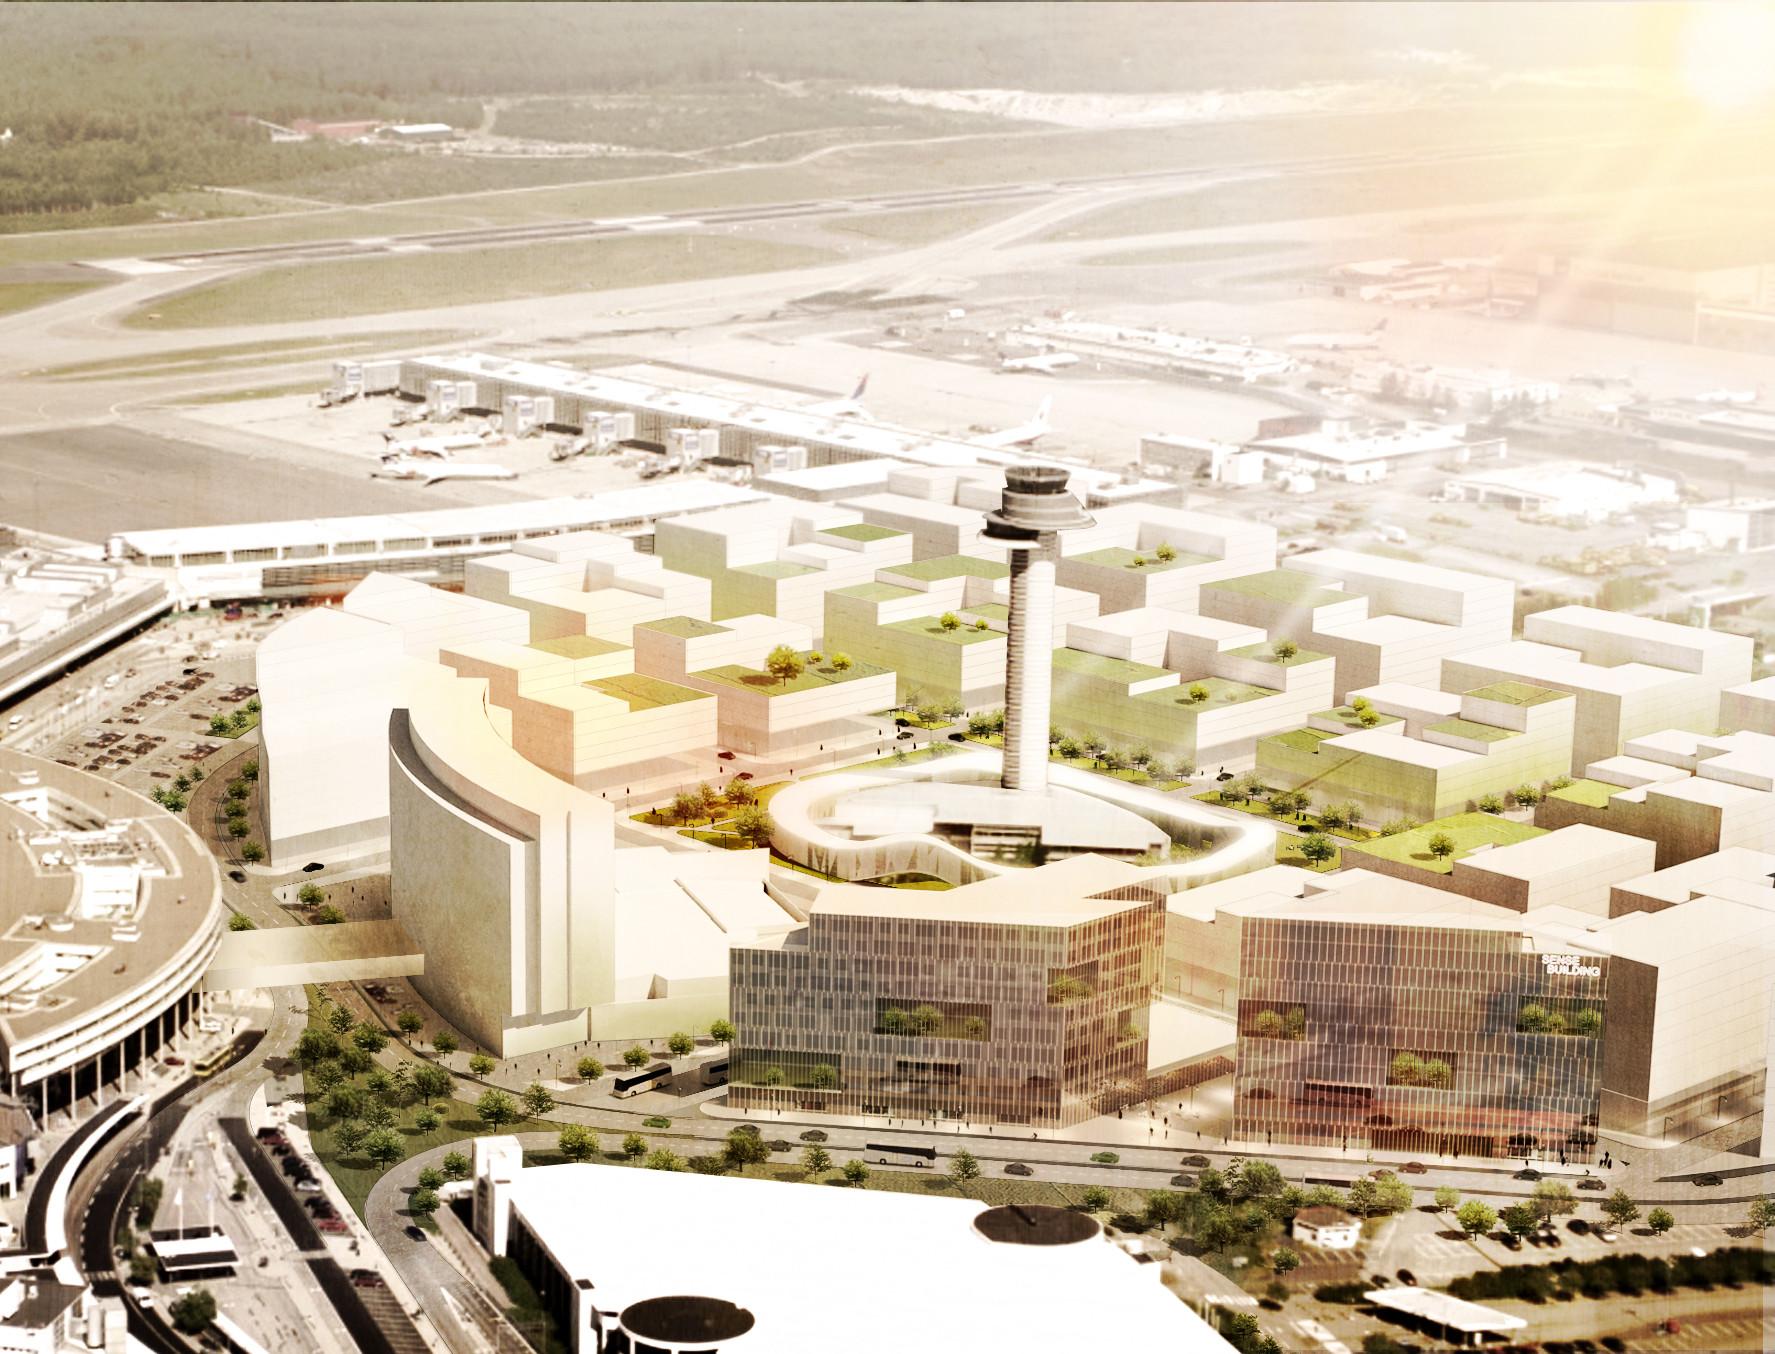 Airport City Stockholm Urban Design Strategy Proposal / Spacescape, Courtesy DinellJohansson & Spacescape